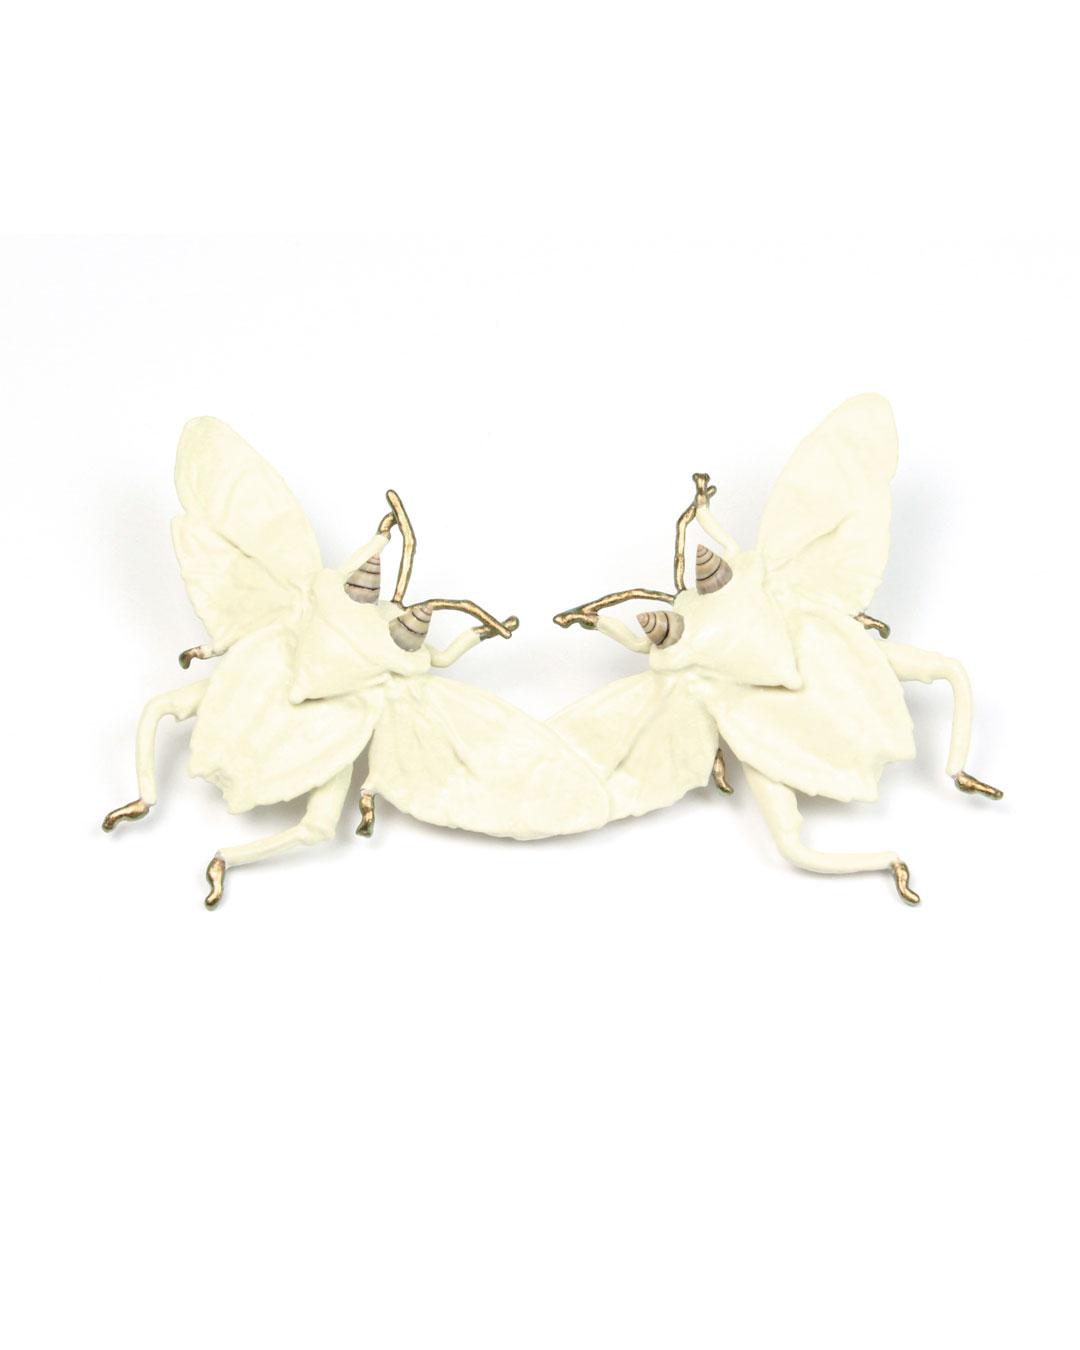 Märta Mattsson, Tweedledee & Tweedledum, 2019, brooch; beetles, copper, lacquer, resin, seashells, silver, 105 x 80 x 30 mm, €1850